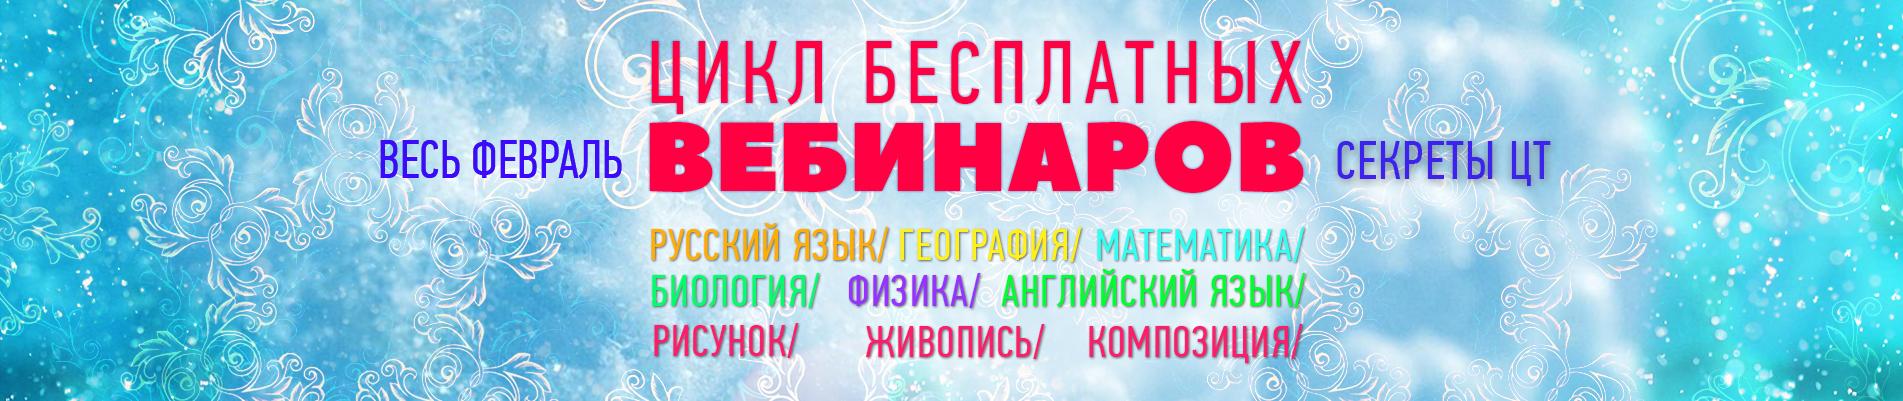 курсы подготовки к цт в Витебске